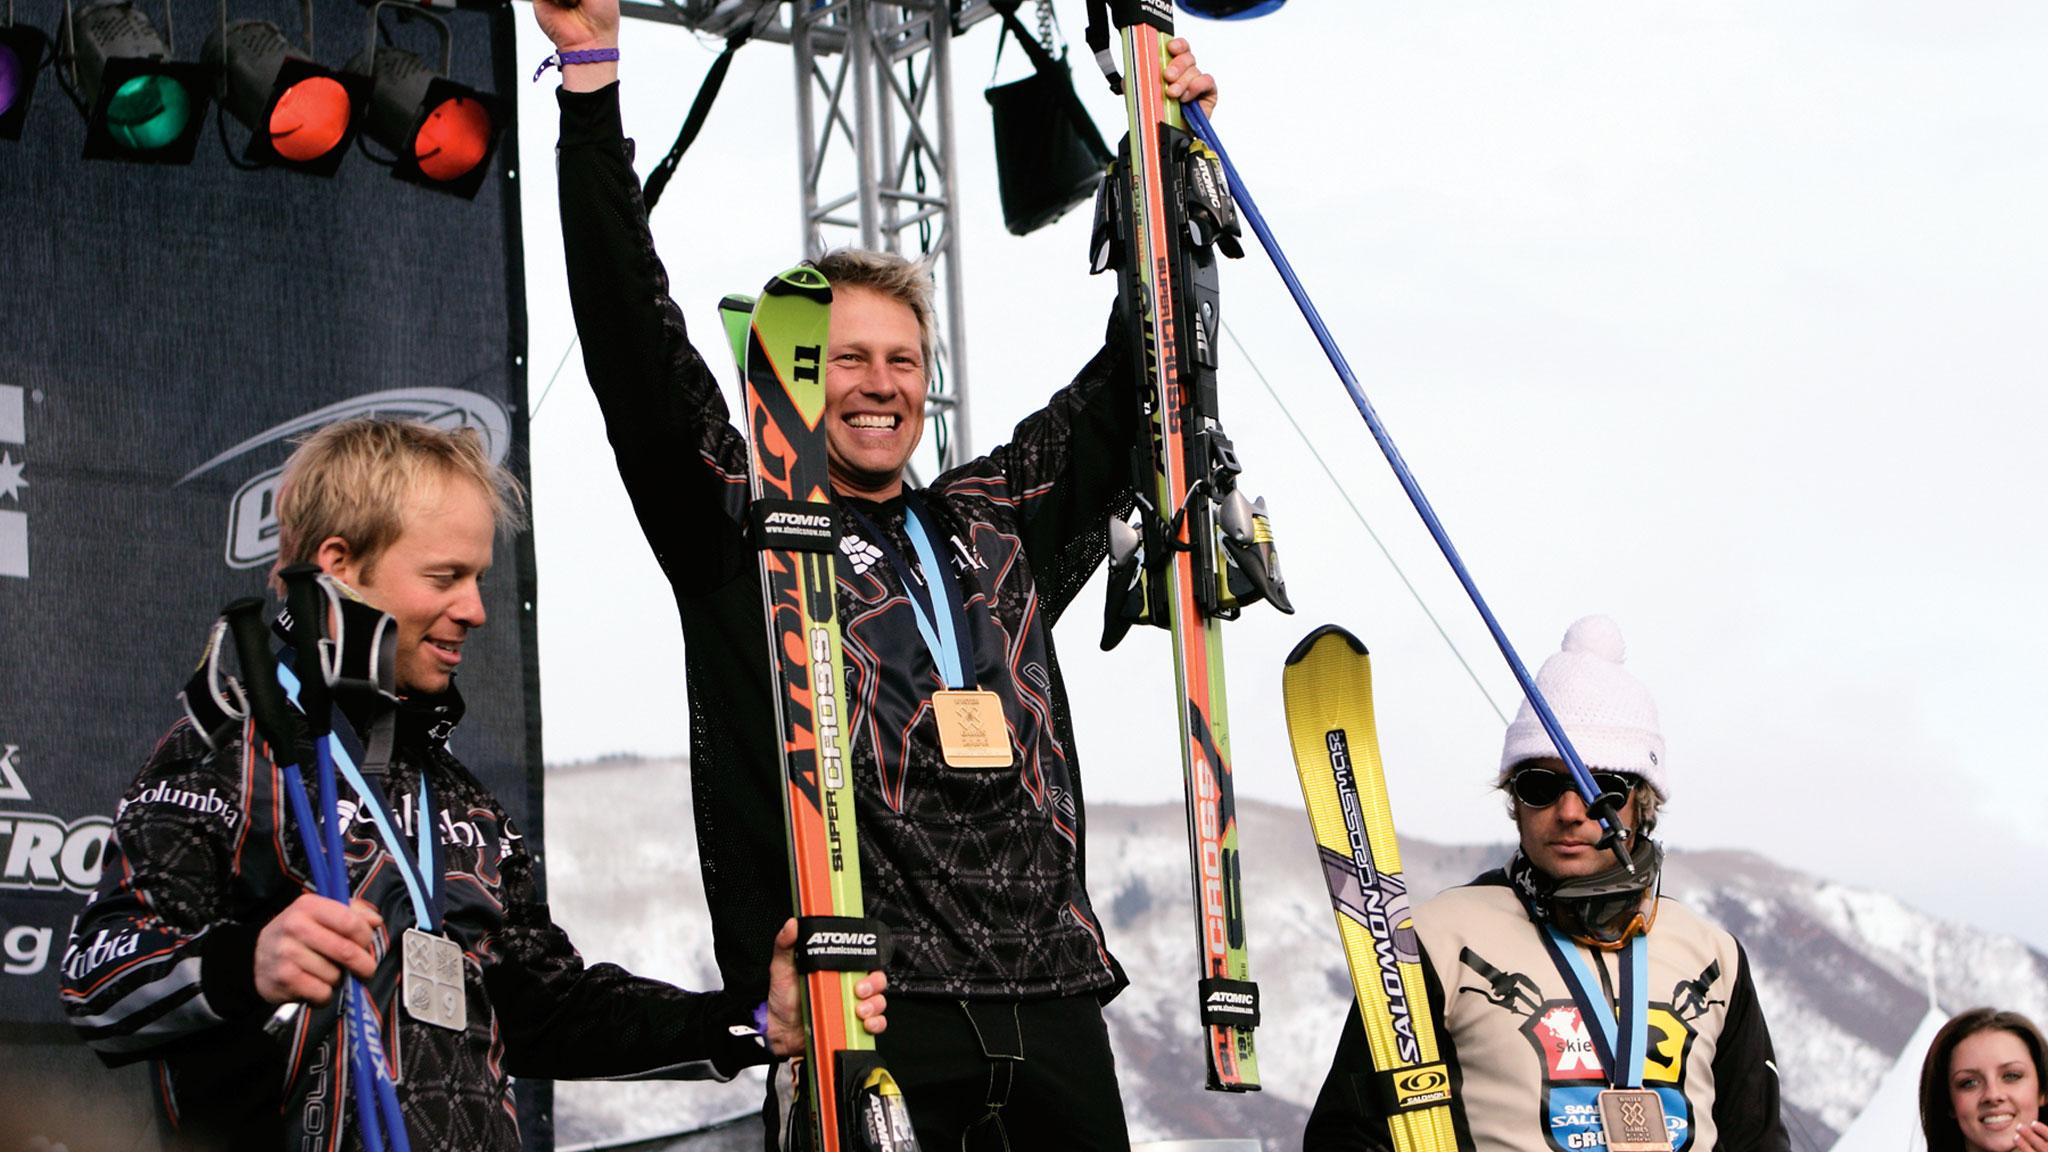 Reggie, Zach and Frenchman Enak Gavaggio on the Skier X podium in 2005.